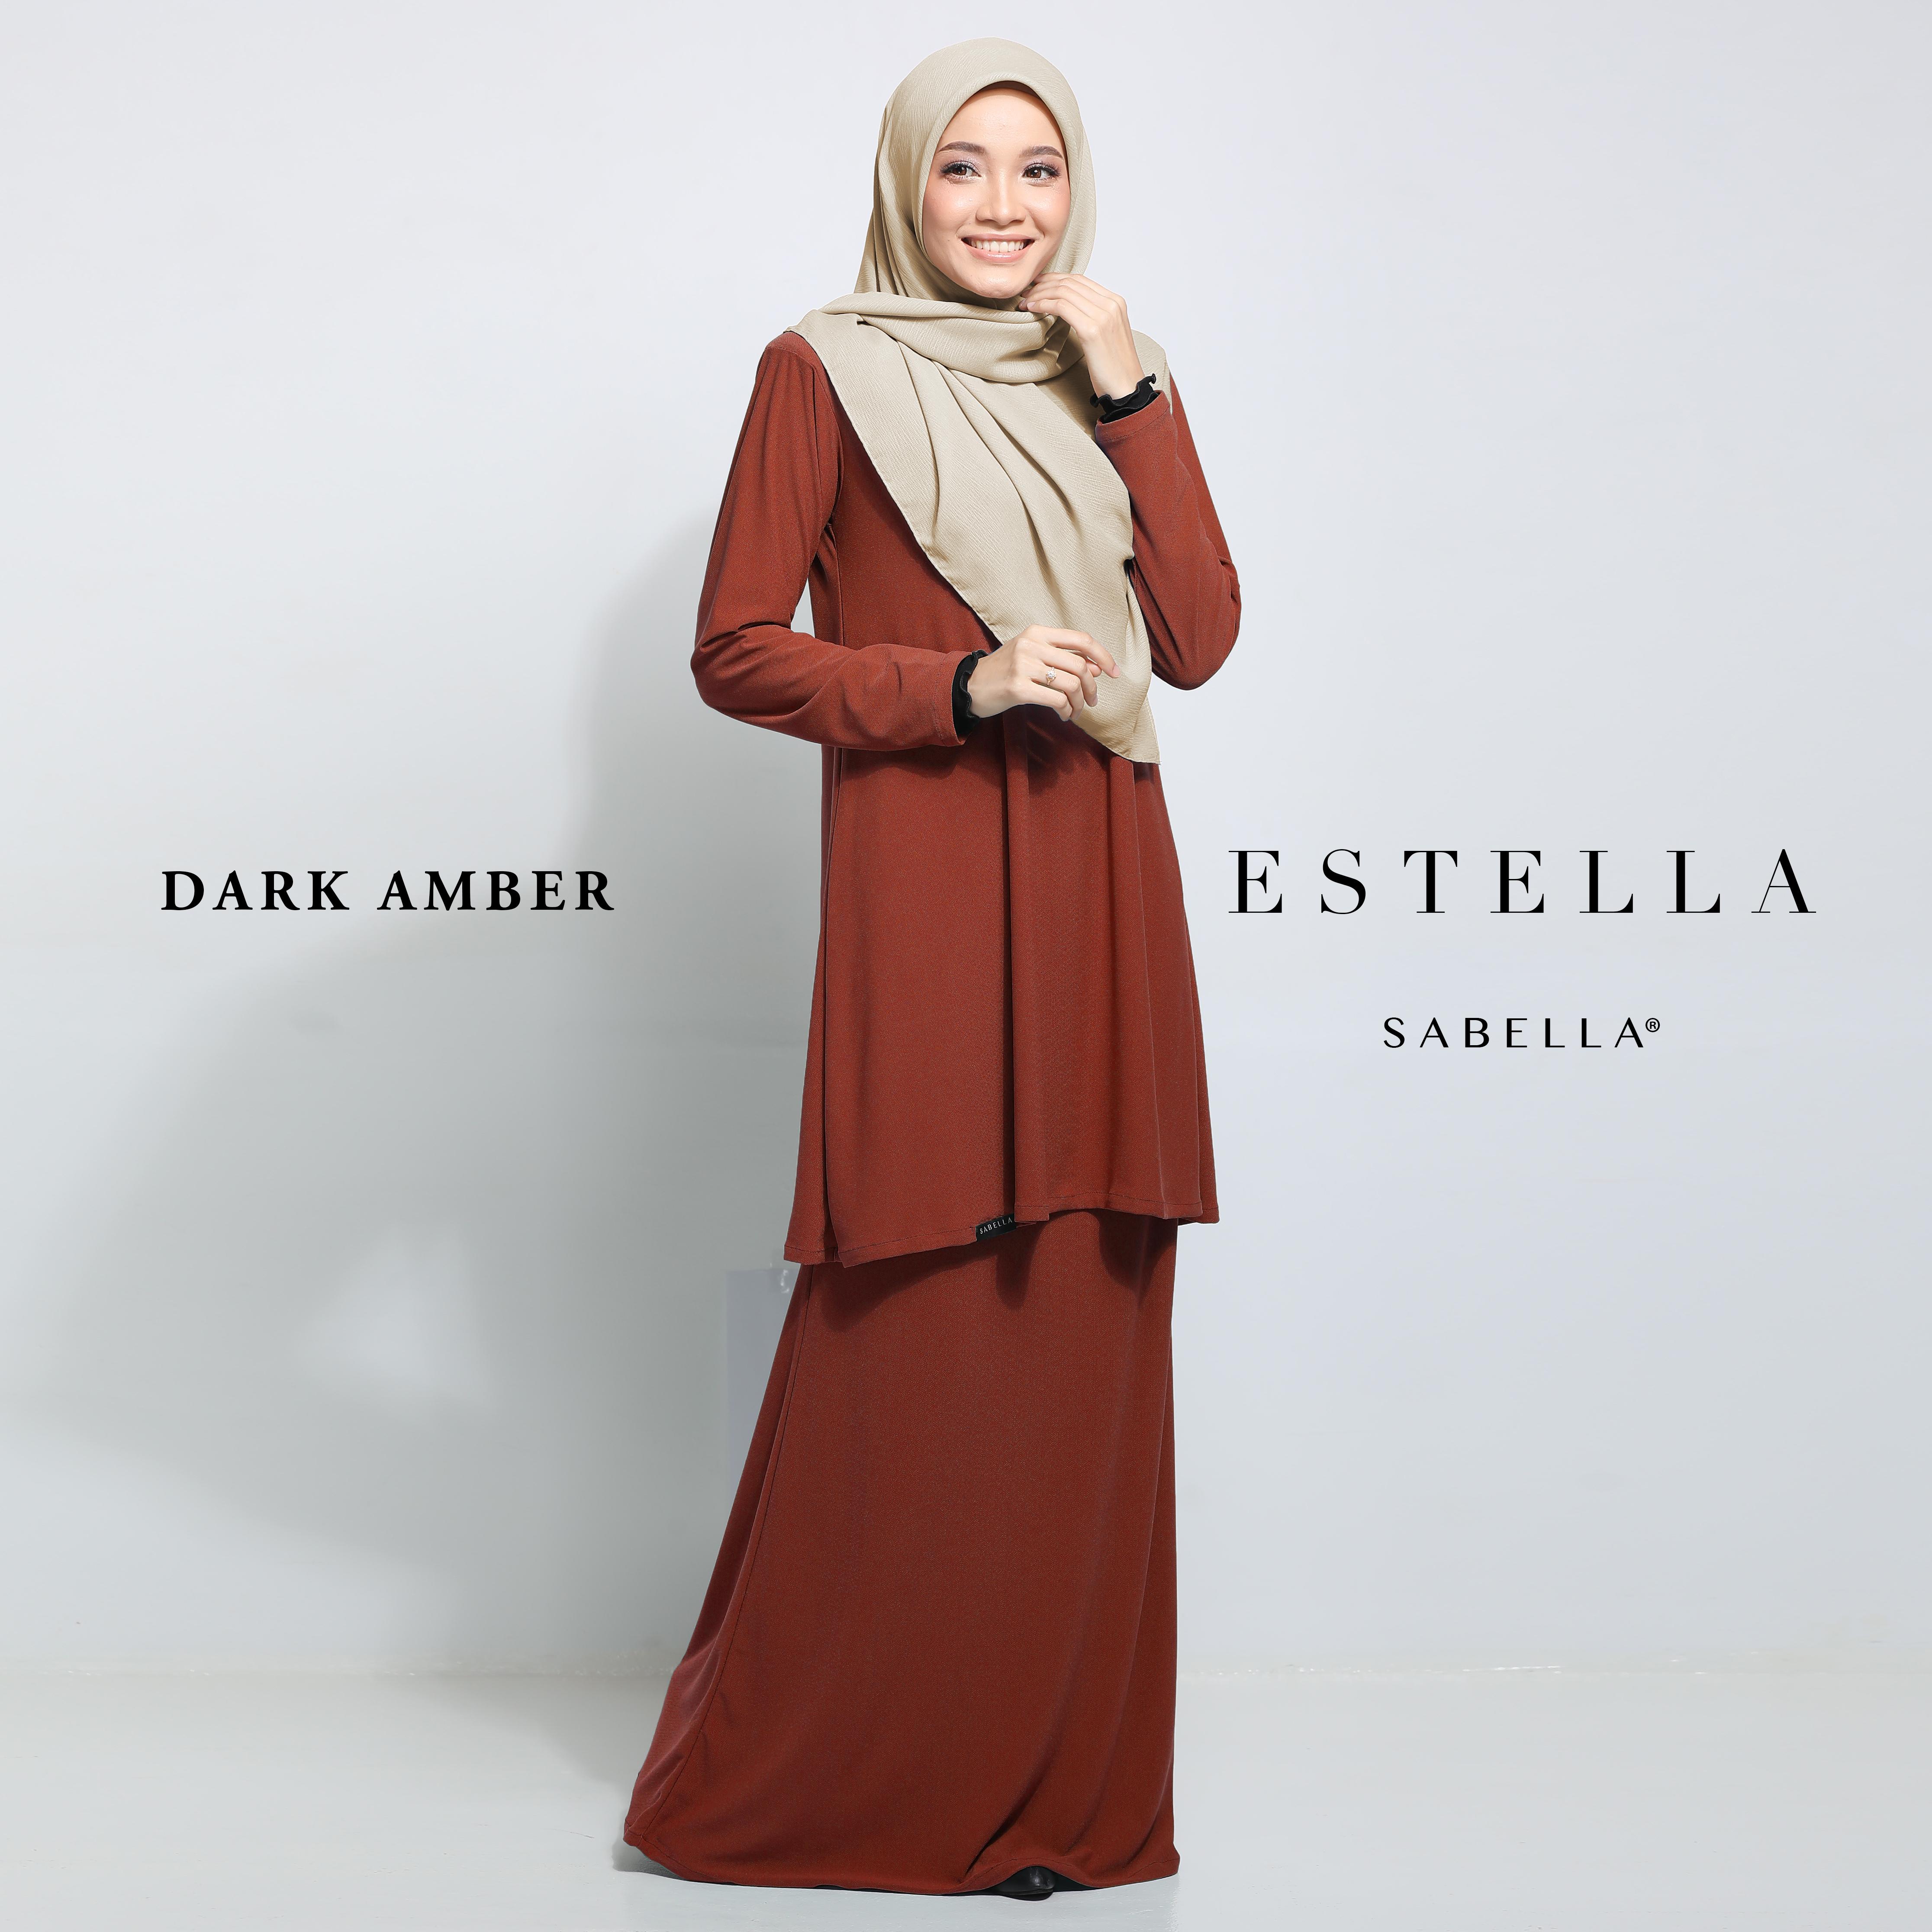 Estella 2.0 Dark Amber